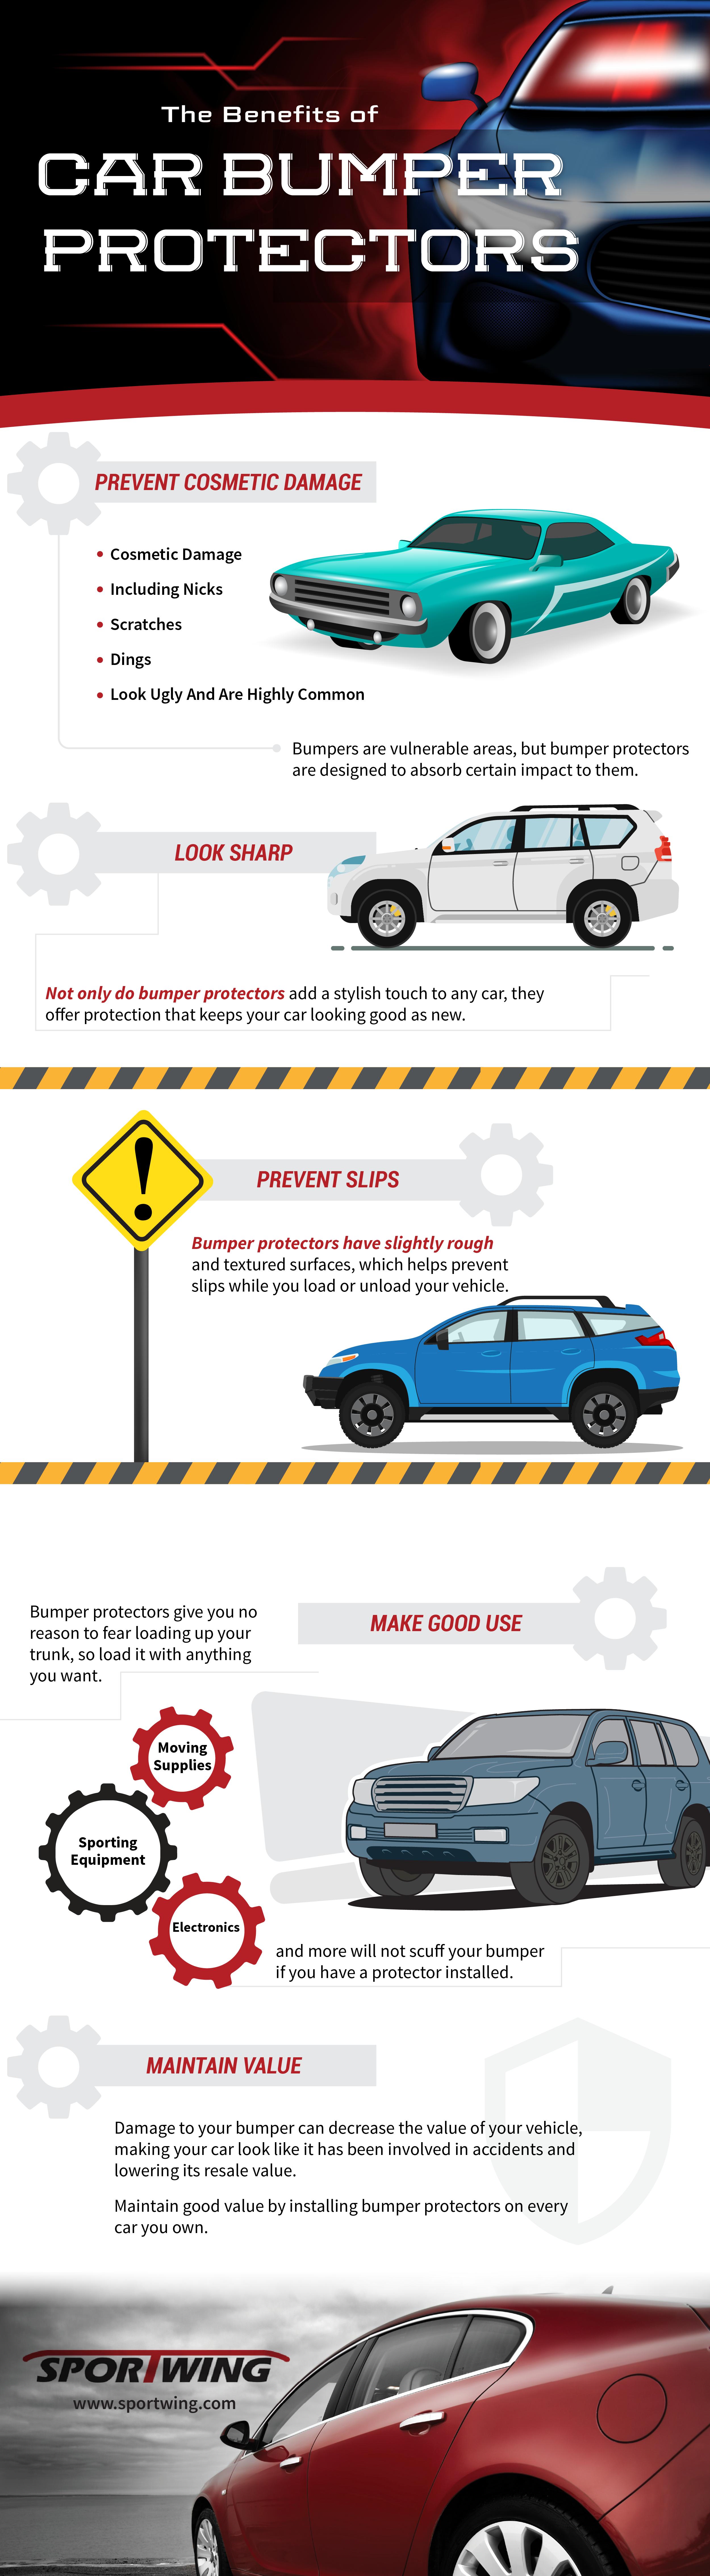 The Benefits Of Car Bumper Protectors Infographic